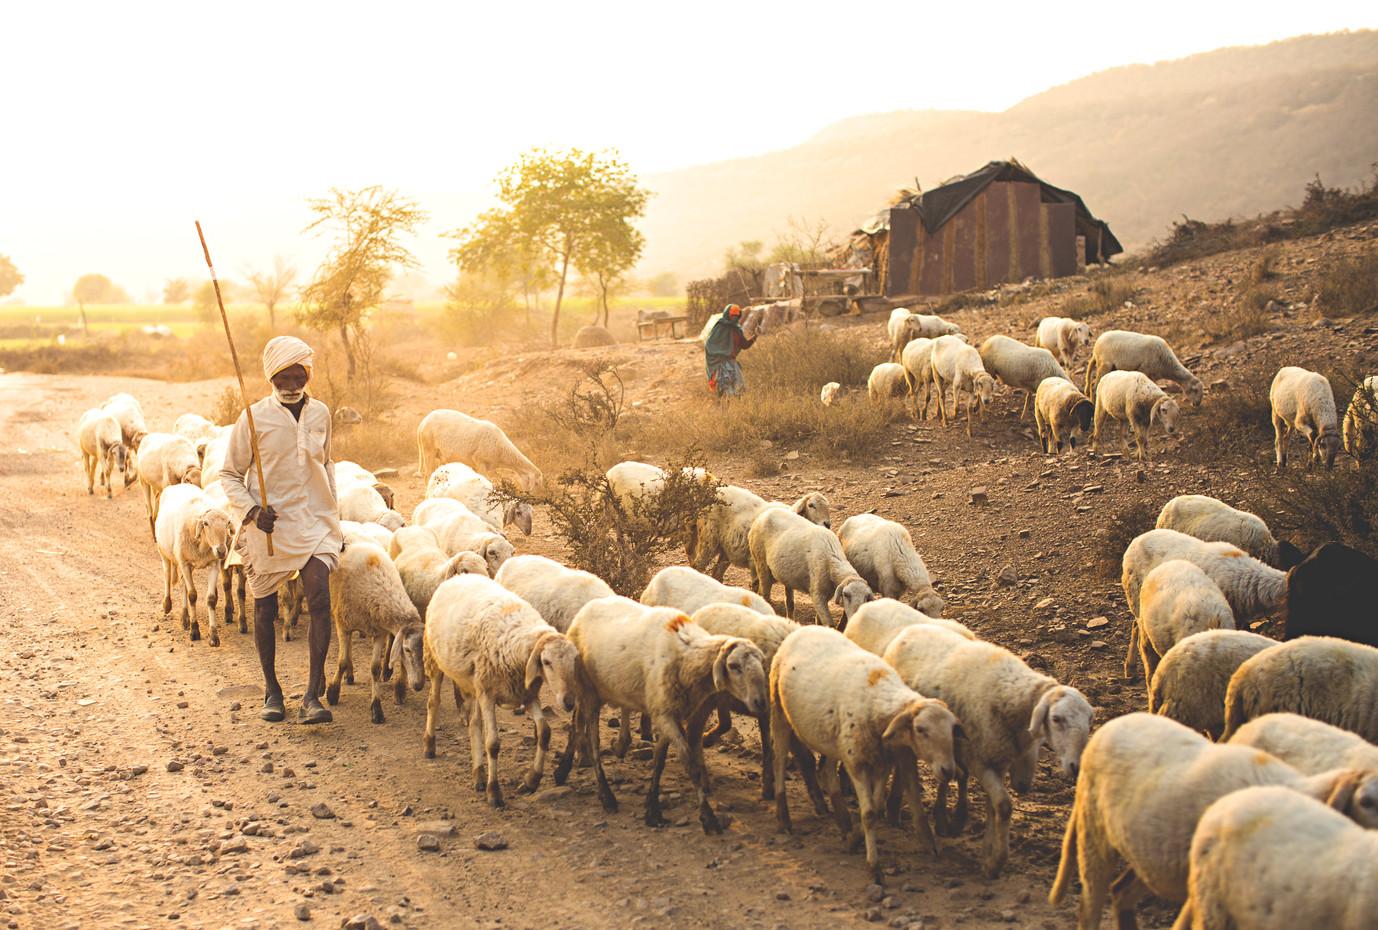 kamilo_bustamante_india_5_18.jpg